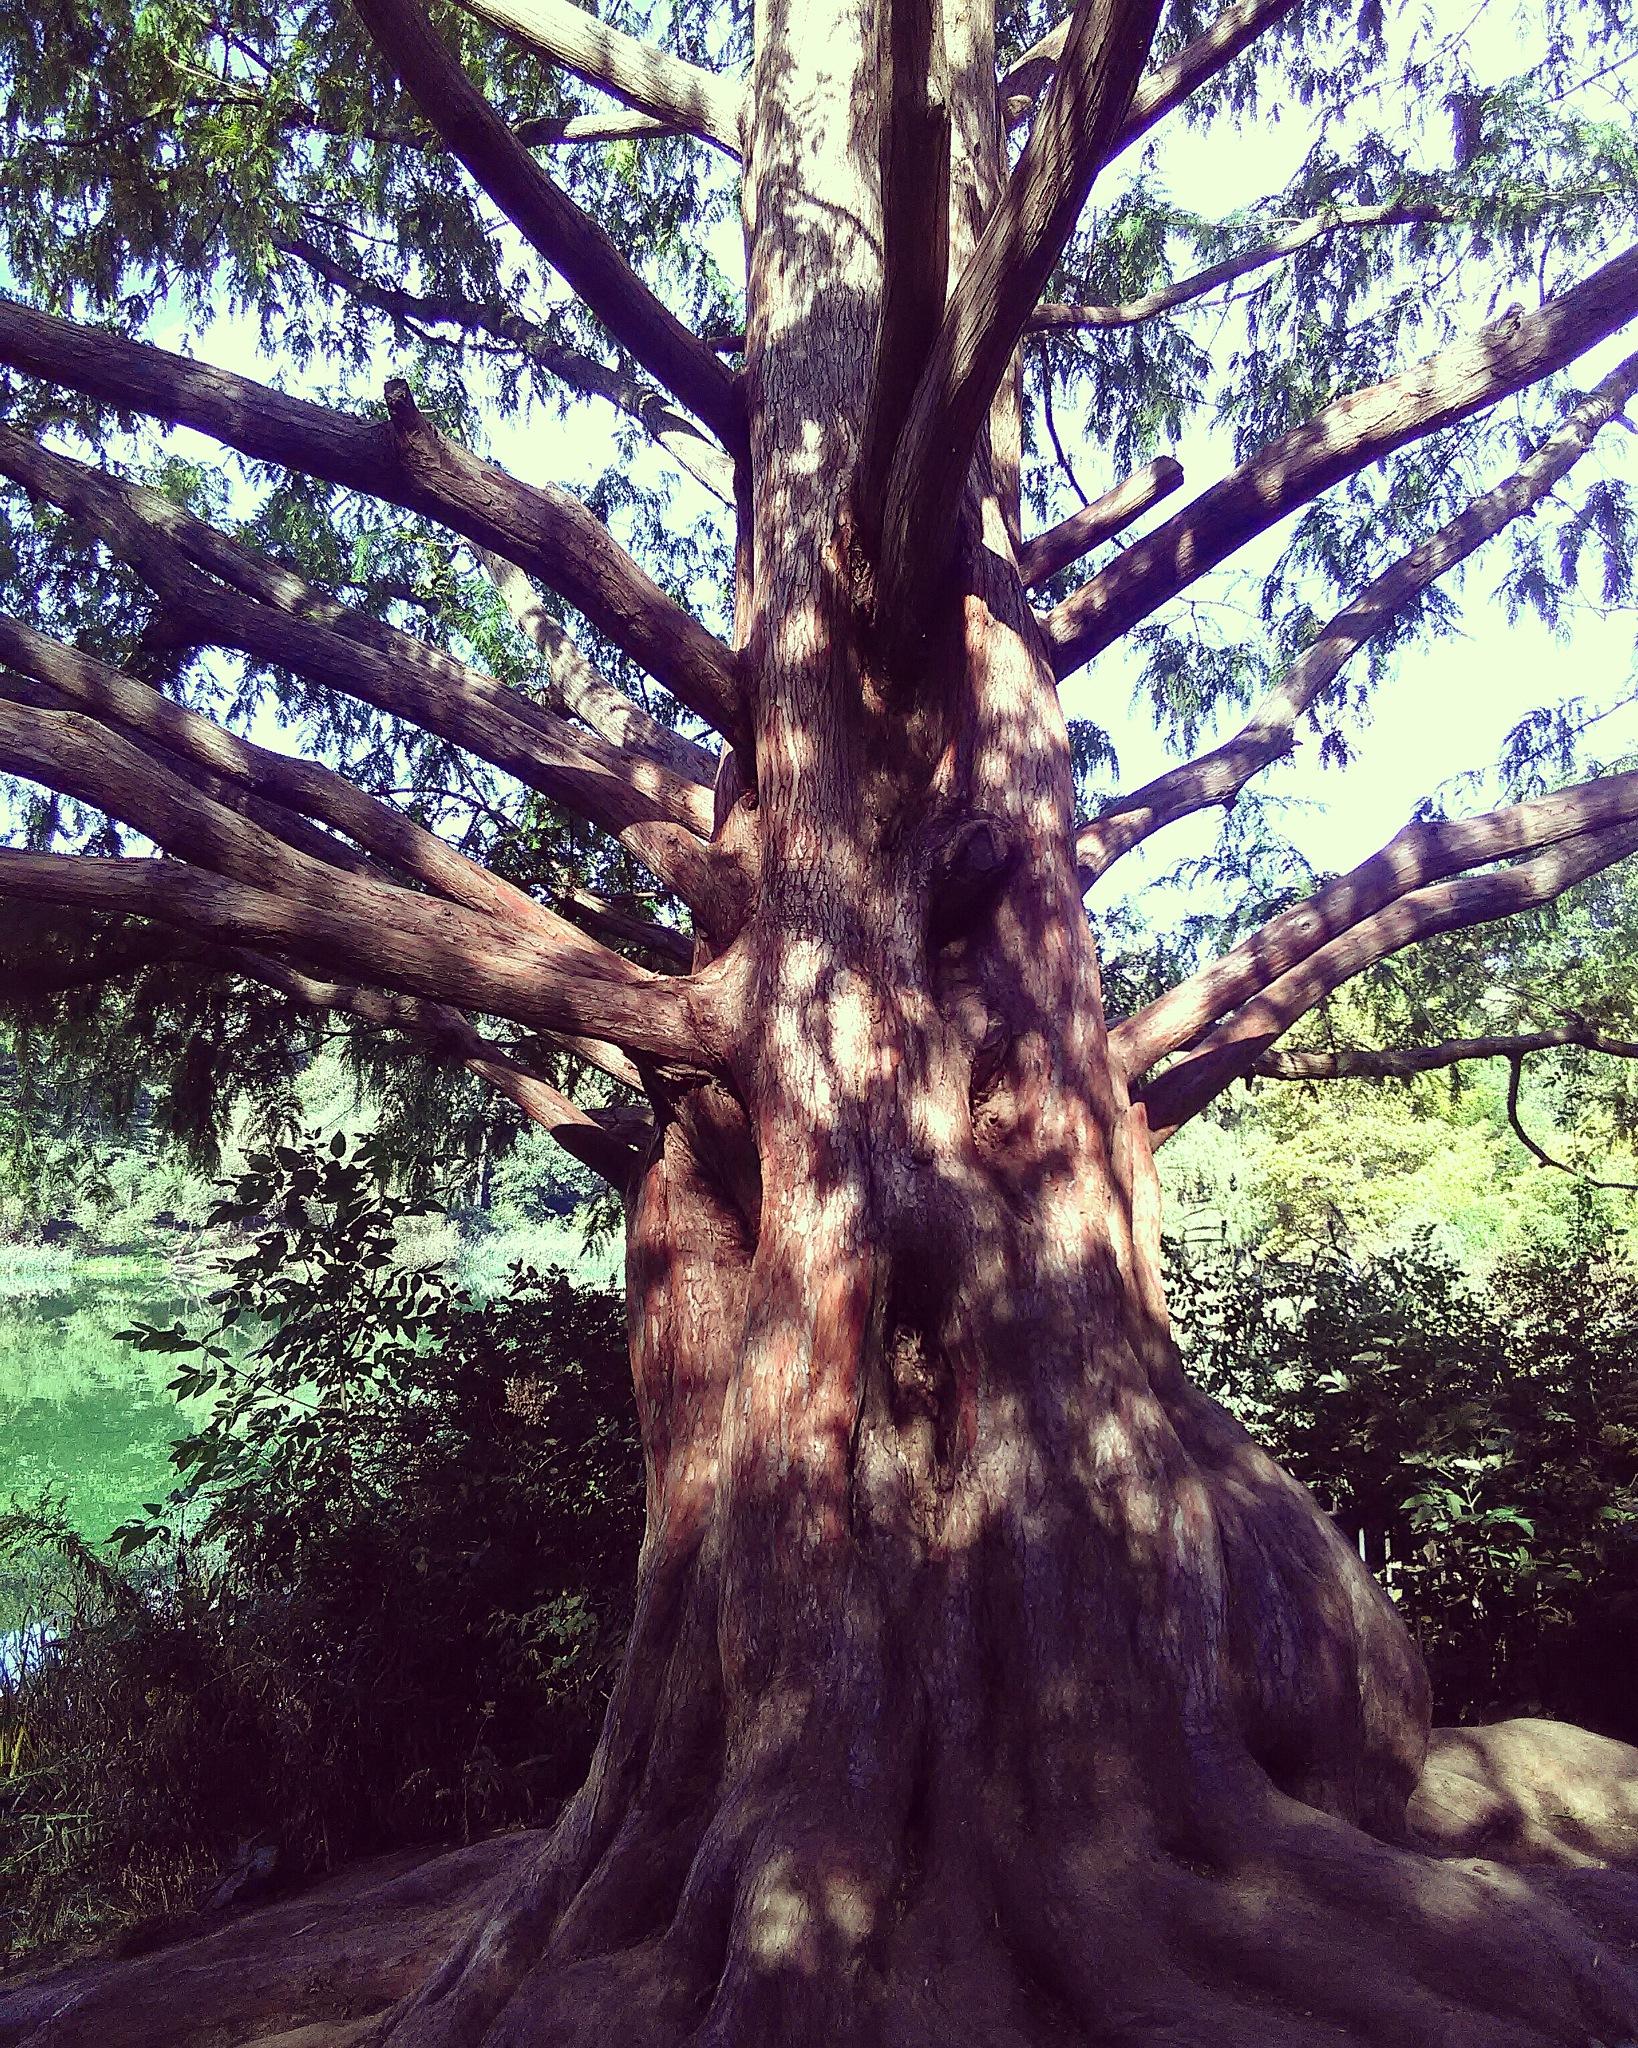 Unique tree in High Park Toronto Canada by smartin3380